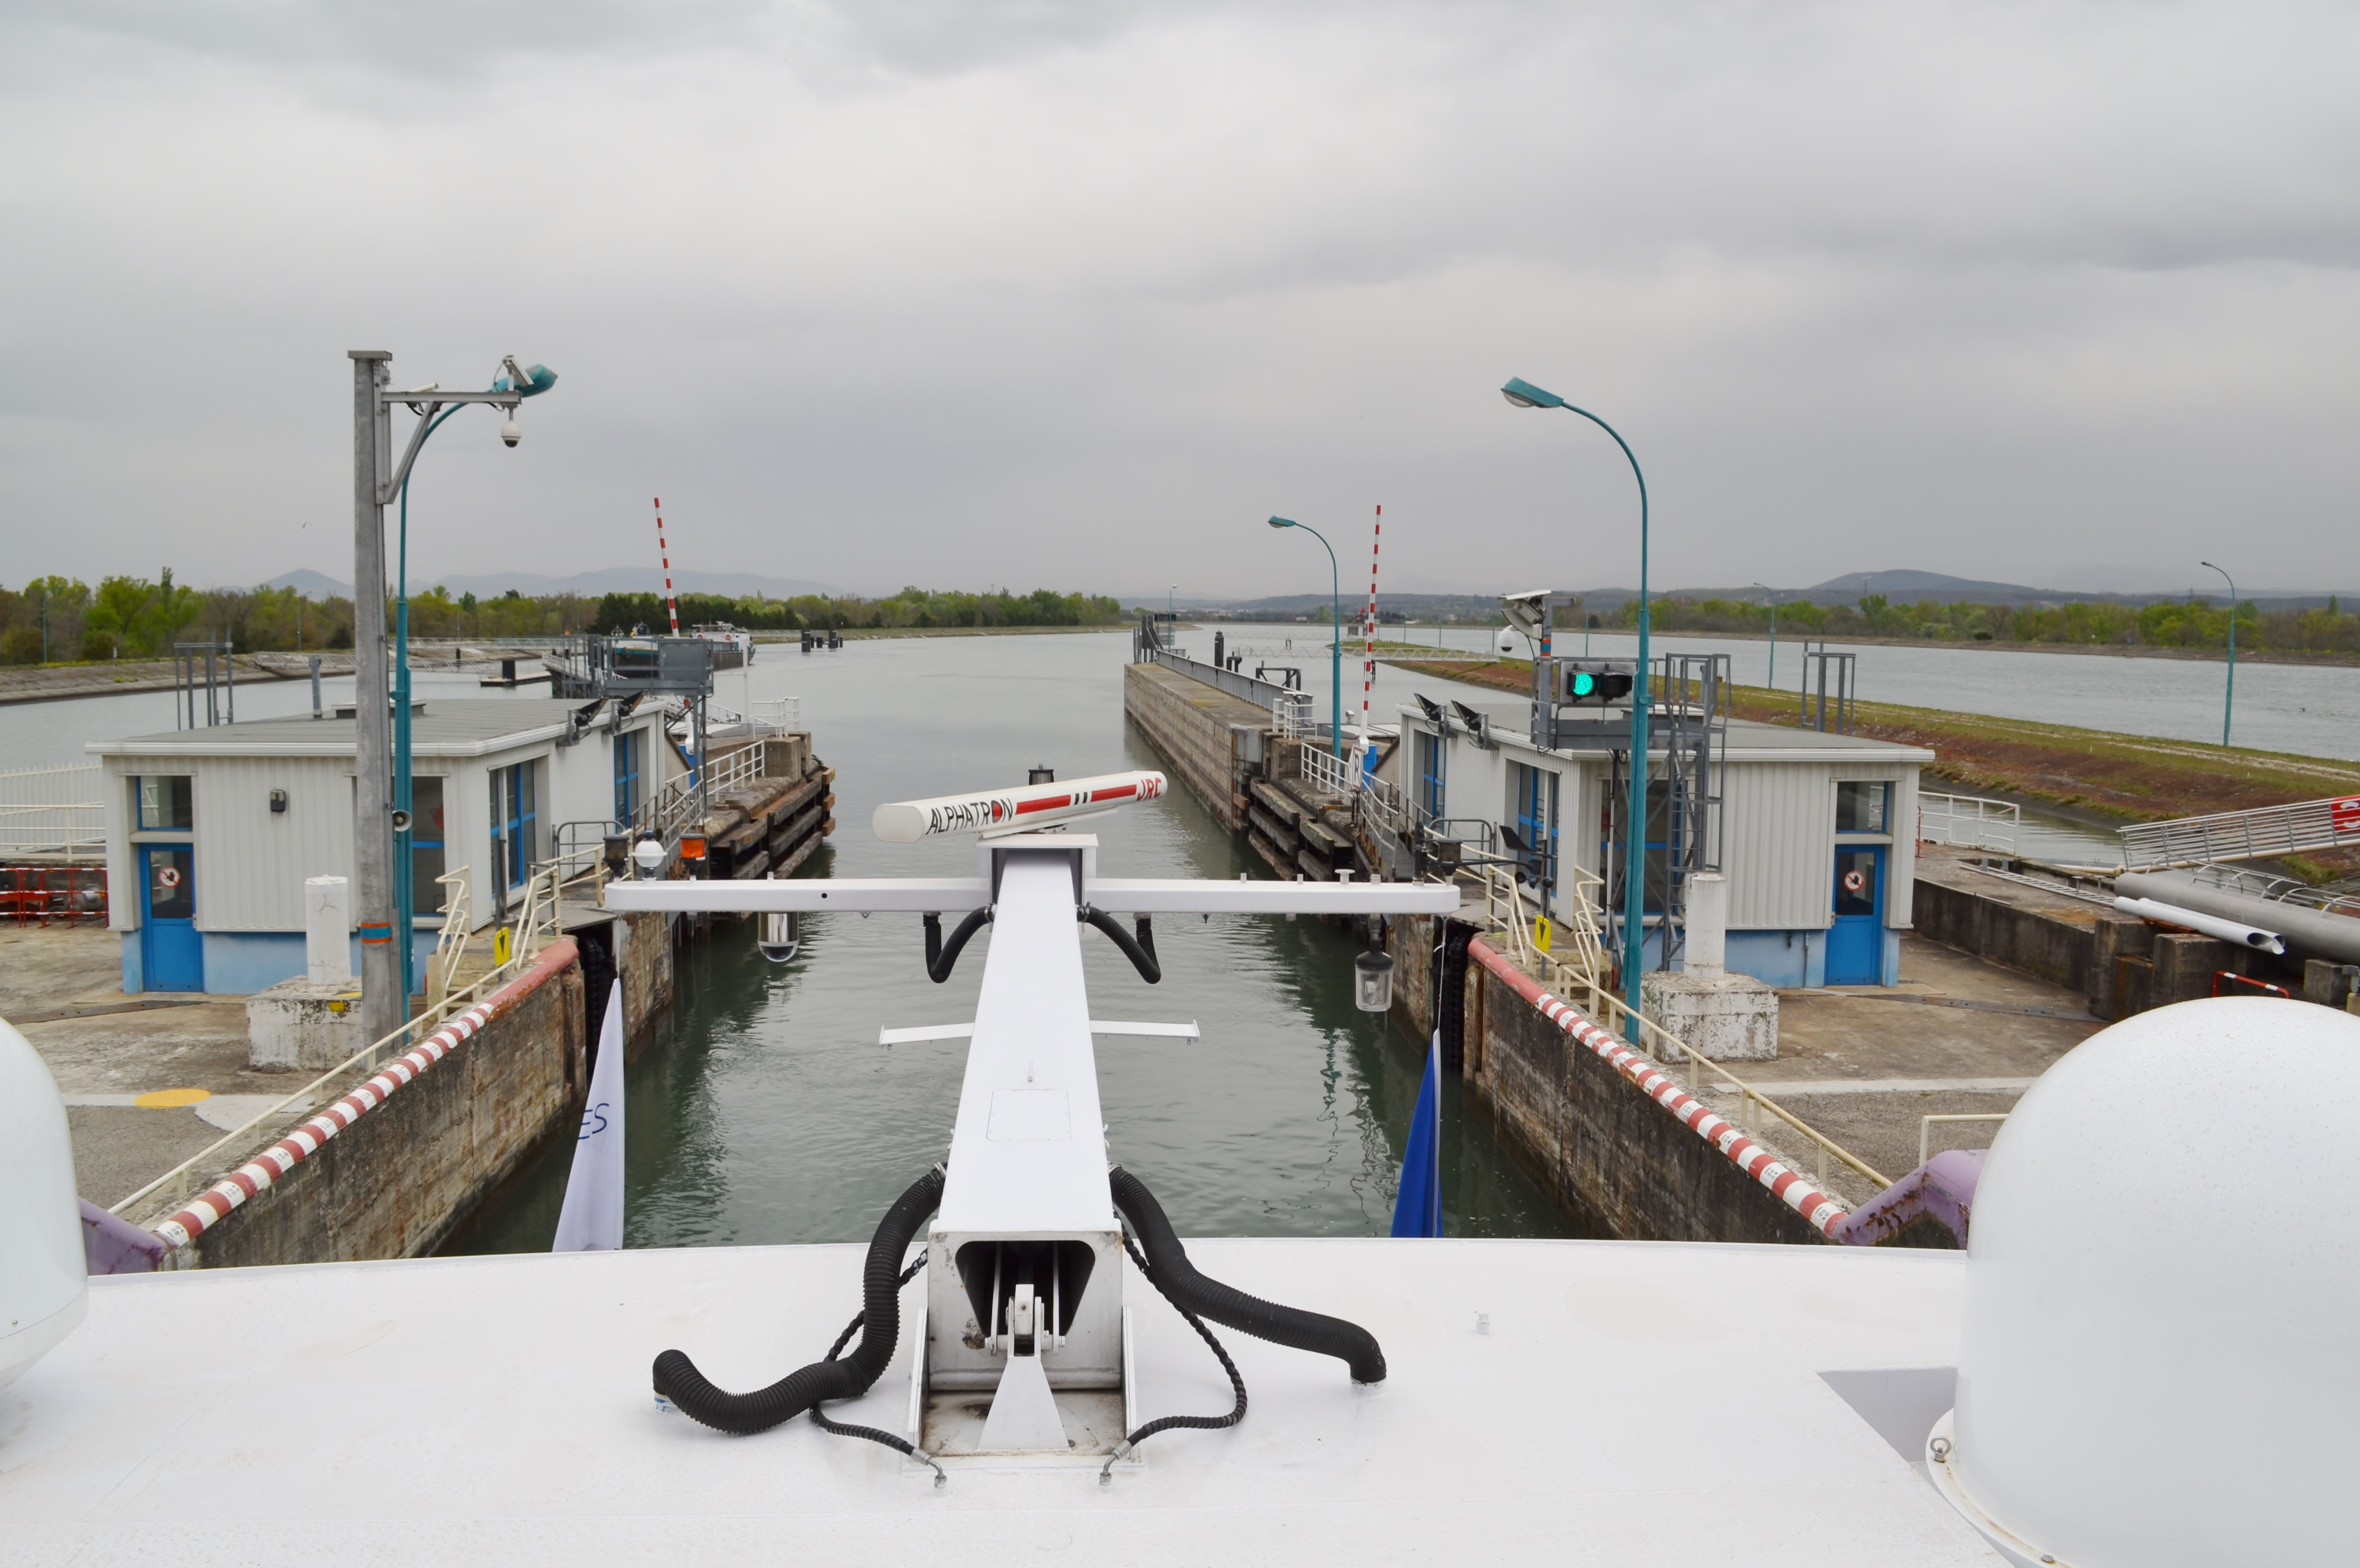 Navigating the Locks on the Rhone River, France